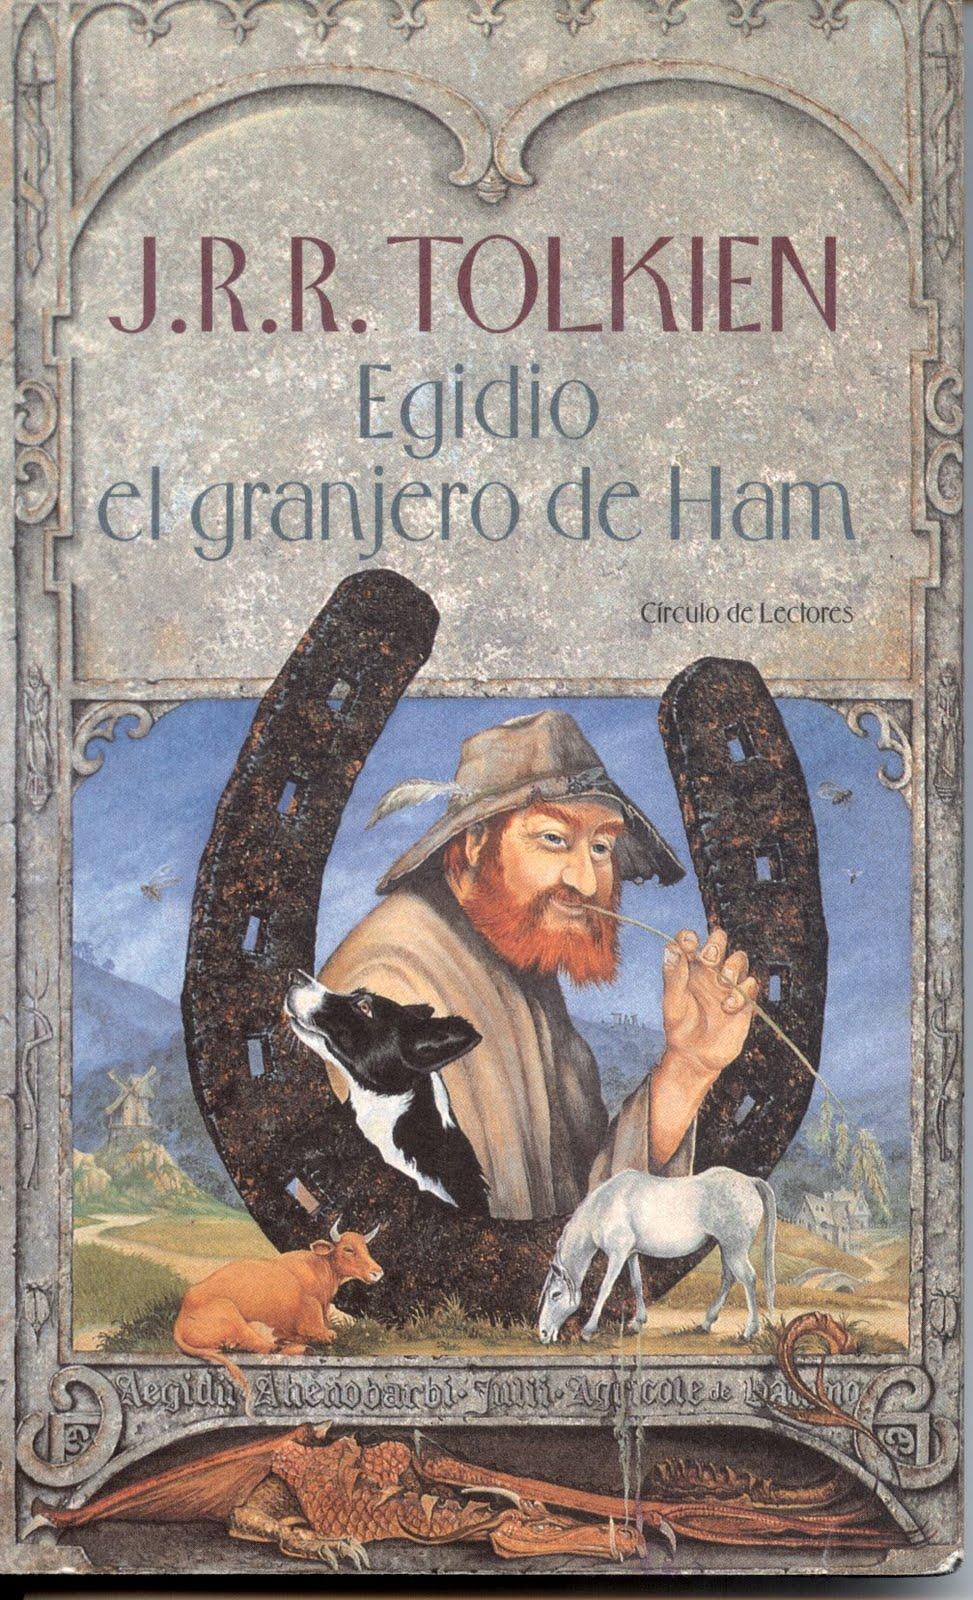 EGIDIO EL GRANJERO DE HAM